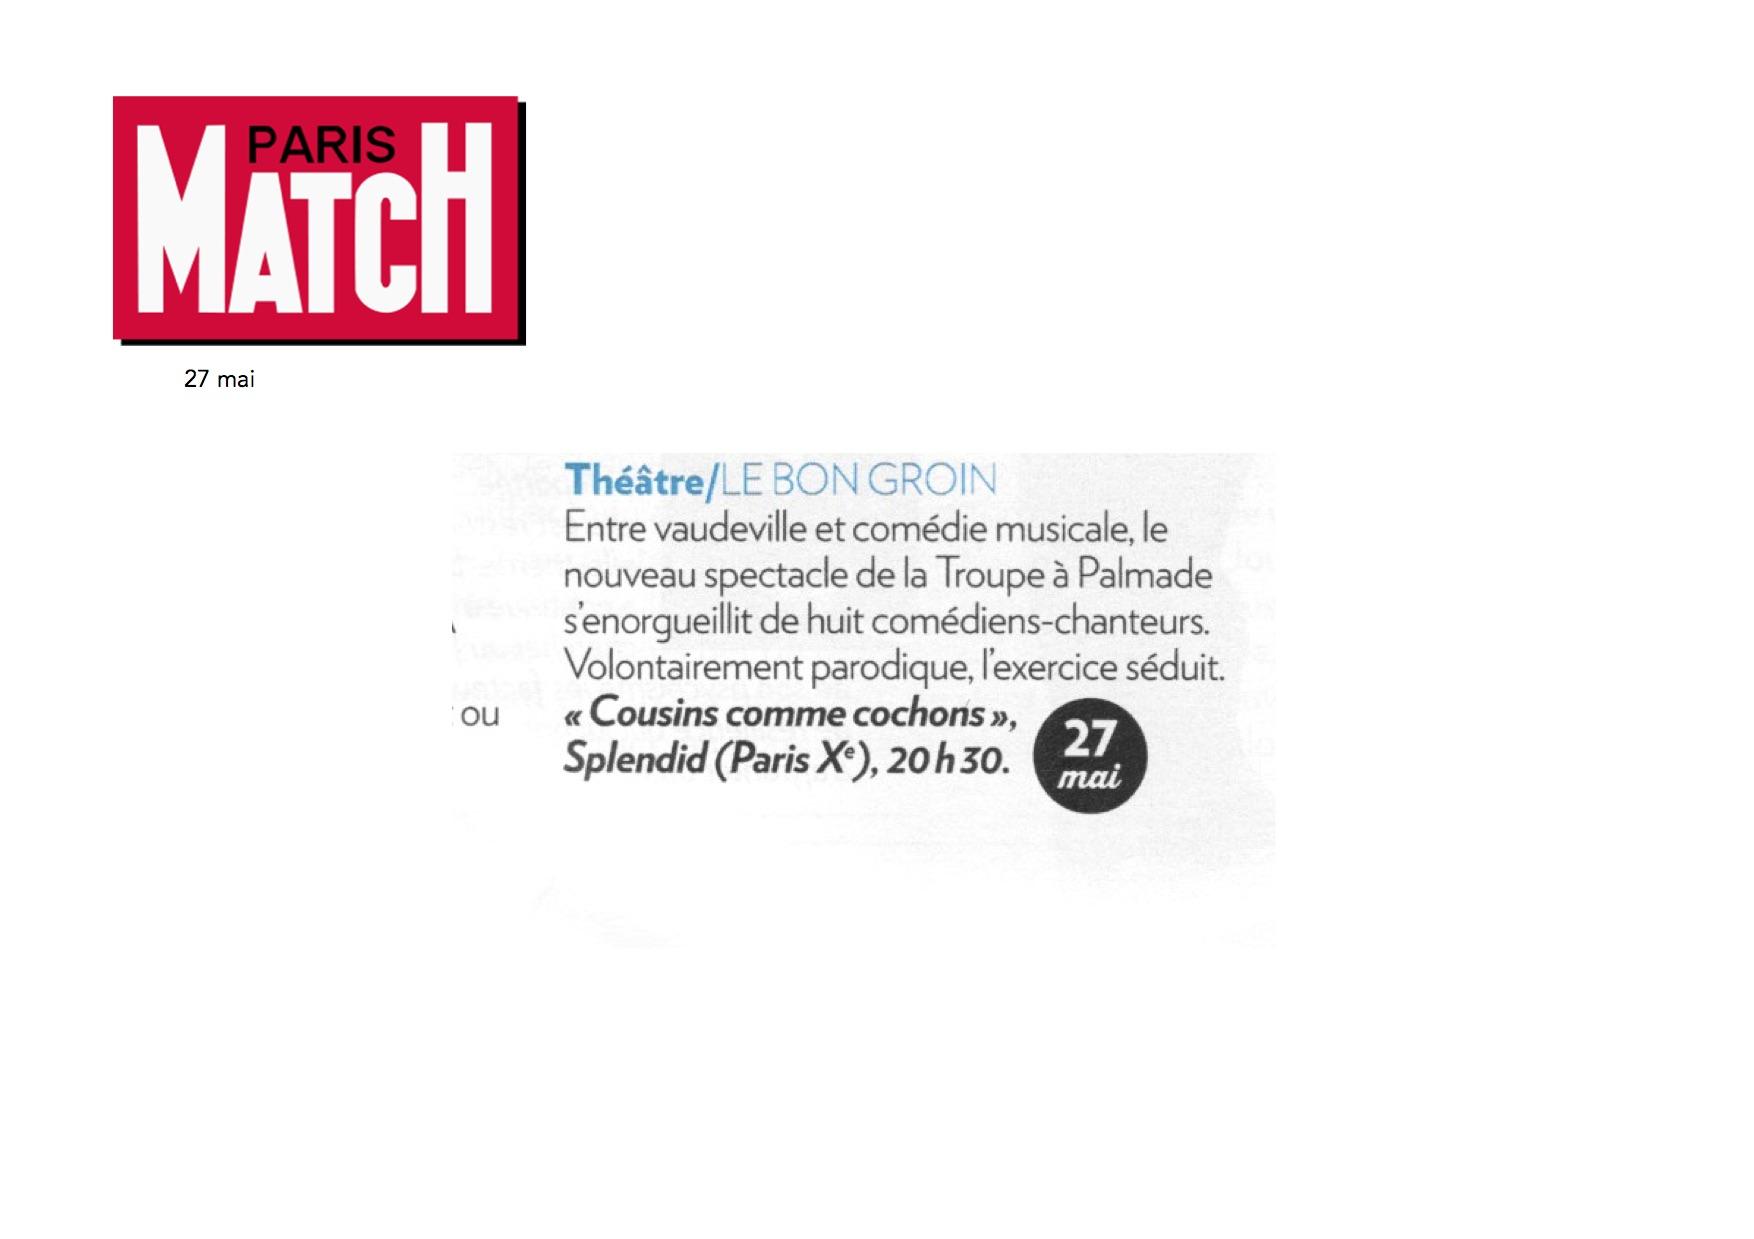 Paris Match 01.06.16